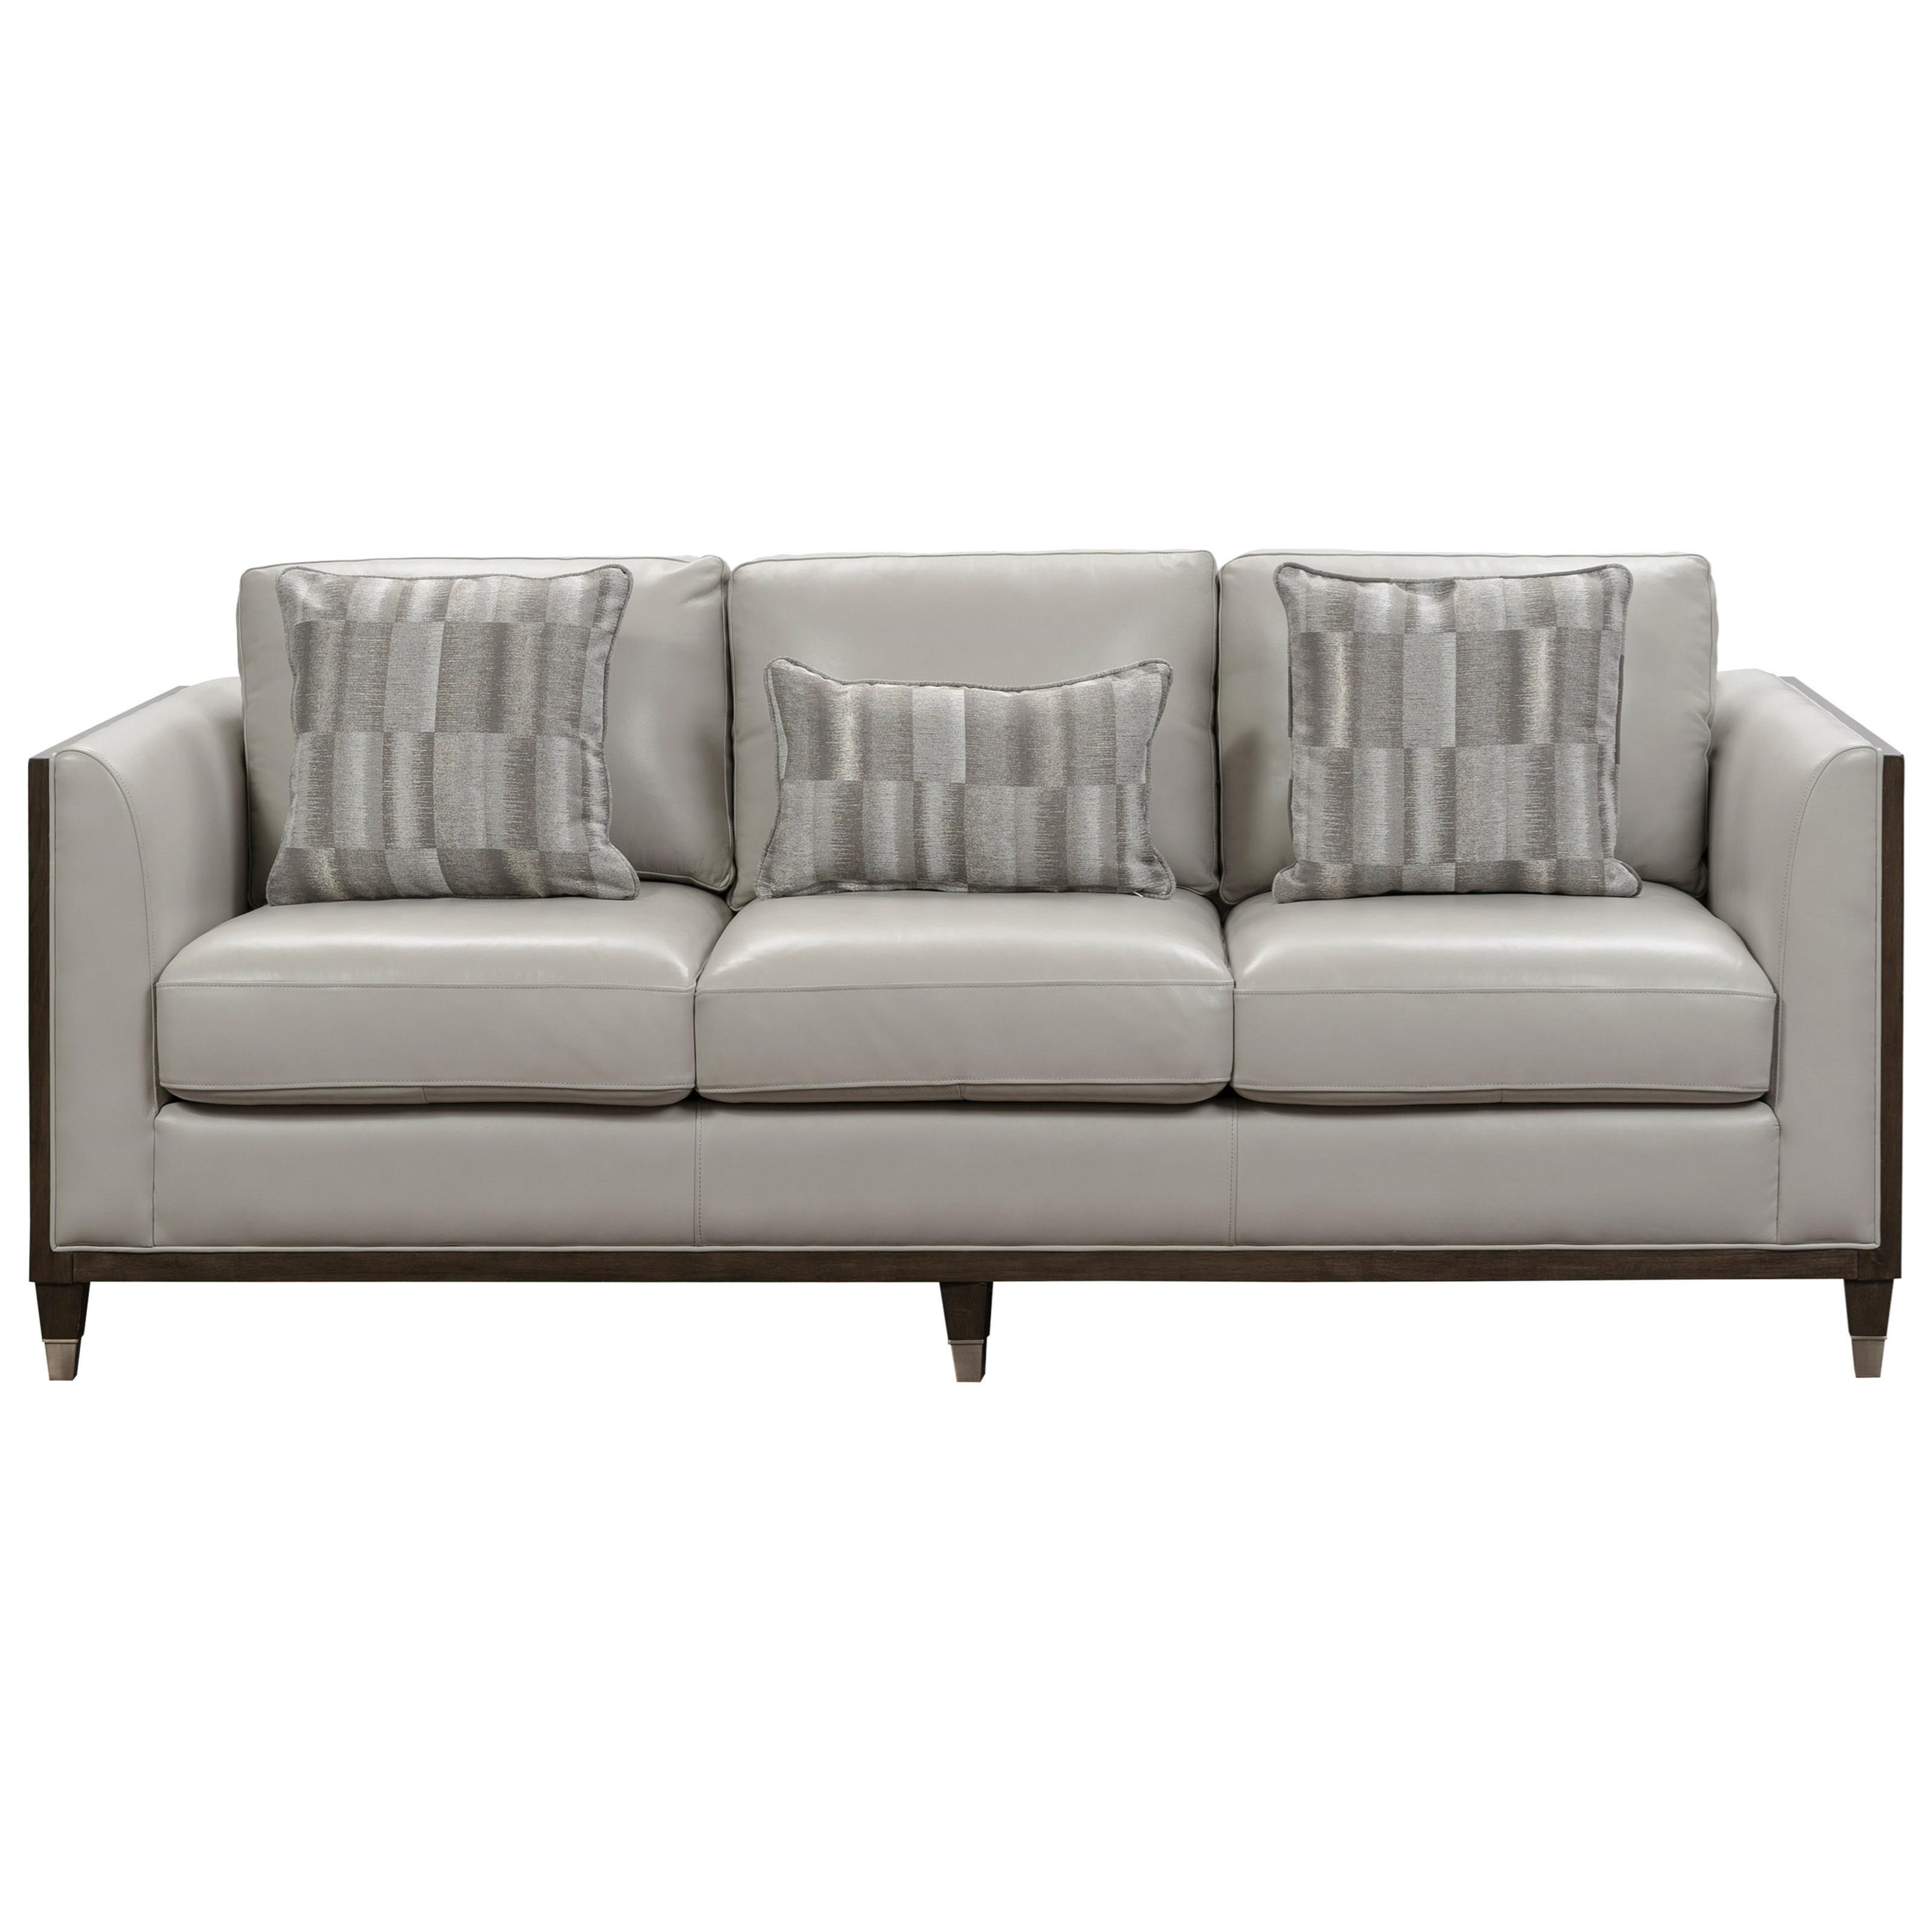 Addison Stationary Uph Sofa by Pulaski Furniture at Carolina Direct